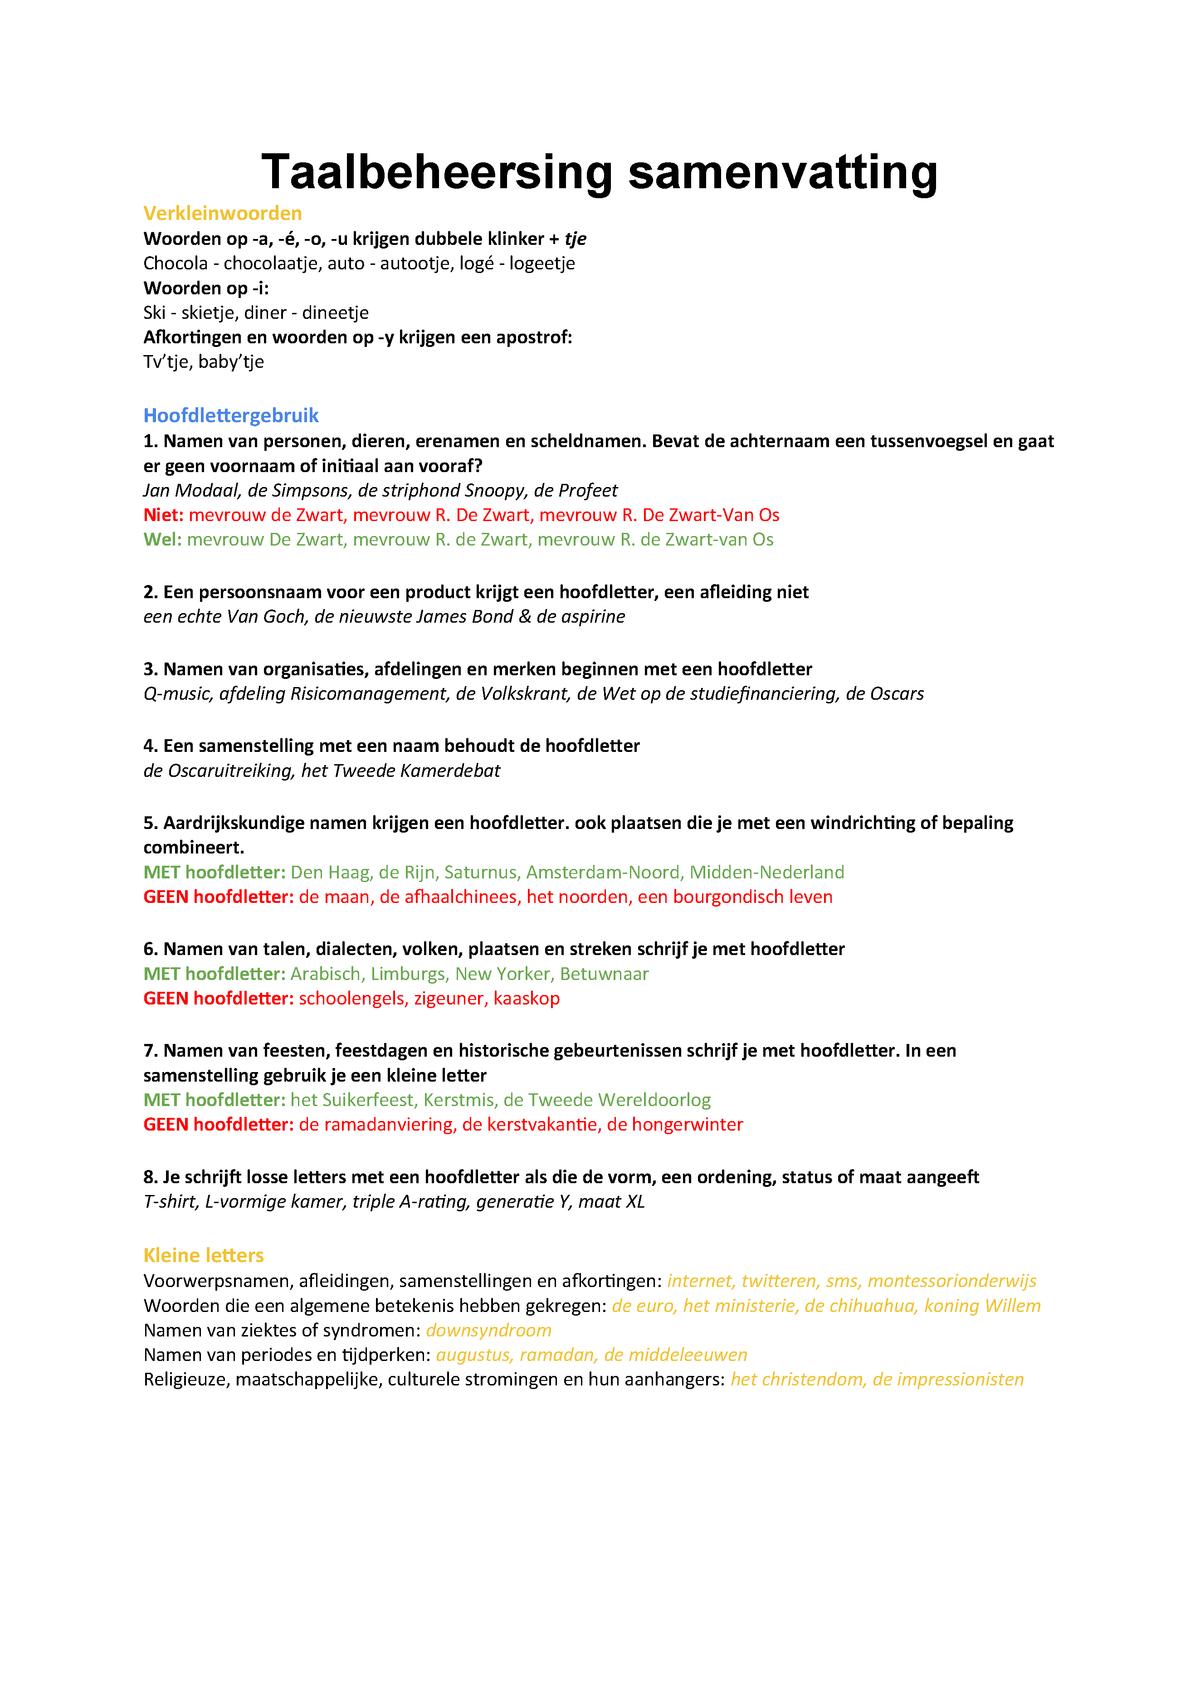 Taalbeheersing Samenvatting M11 Jnvm11tbh1718 Studocu